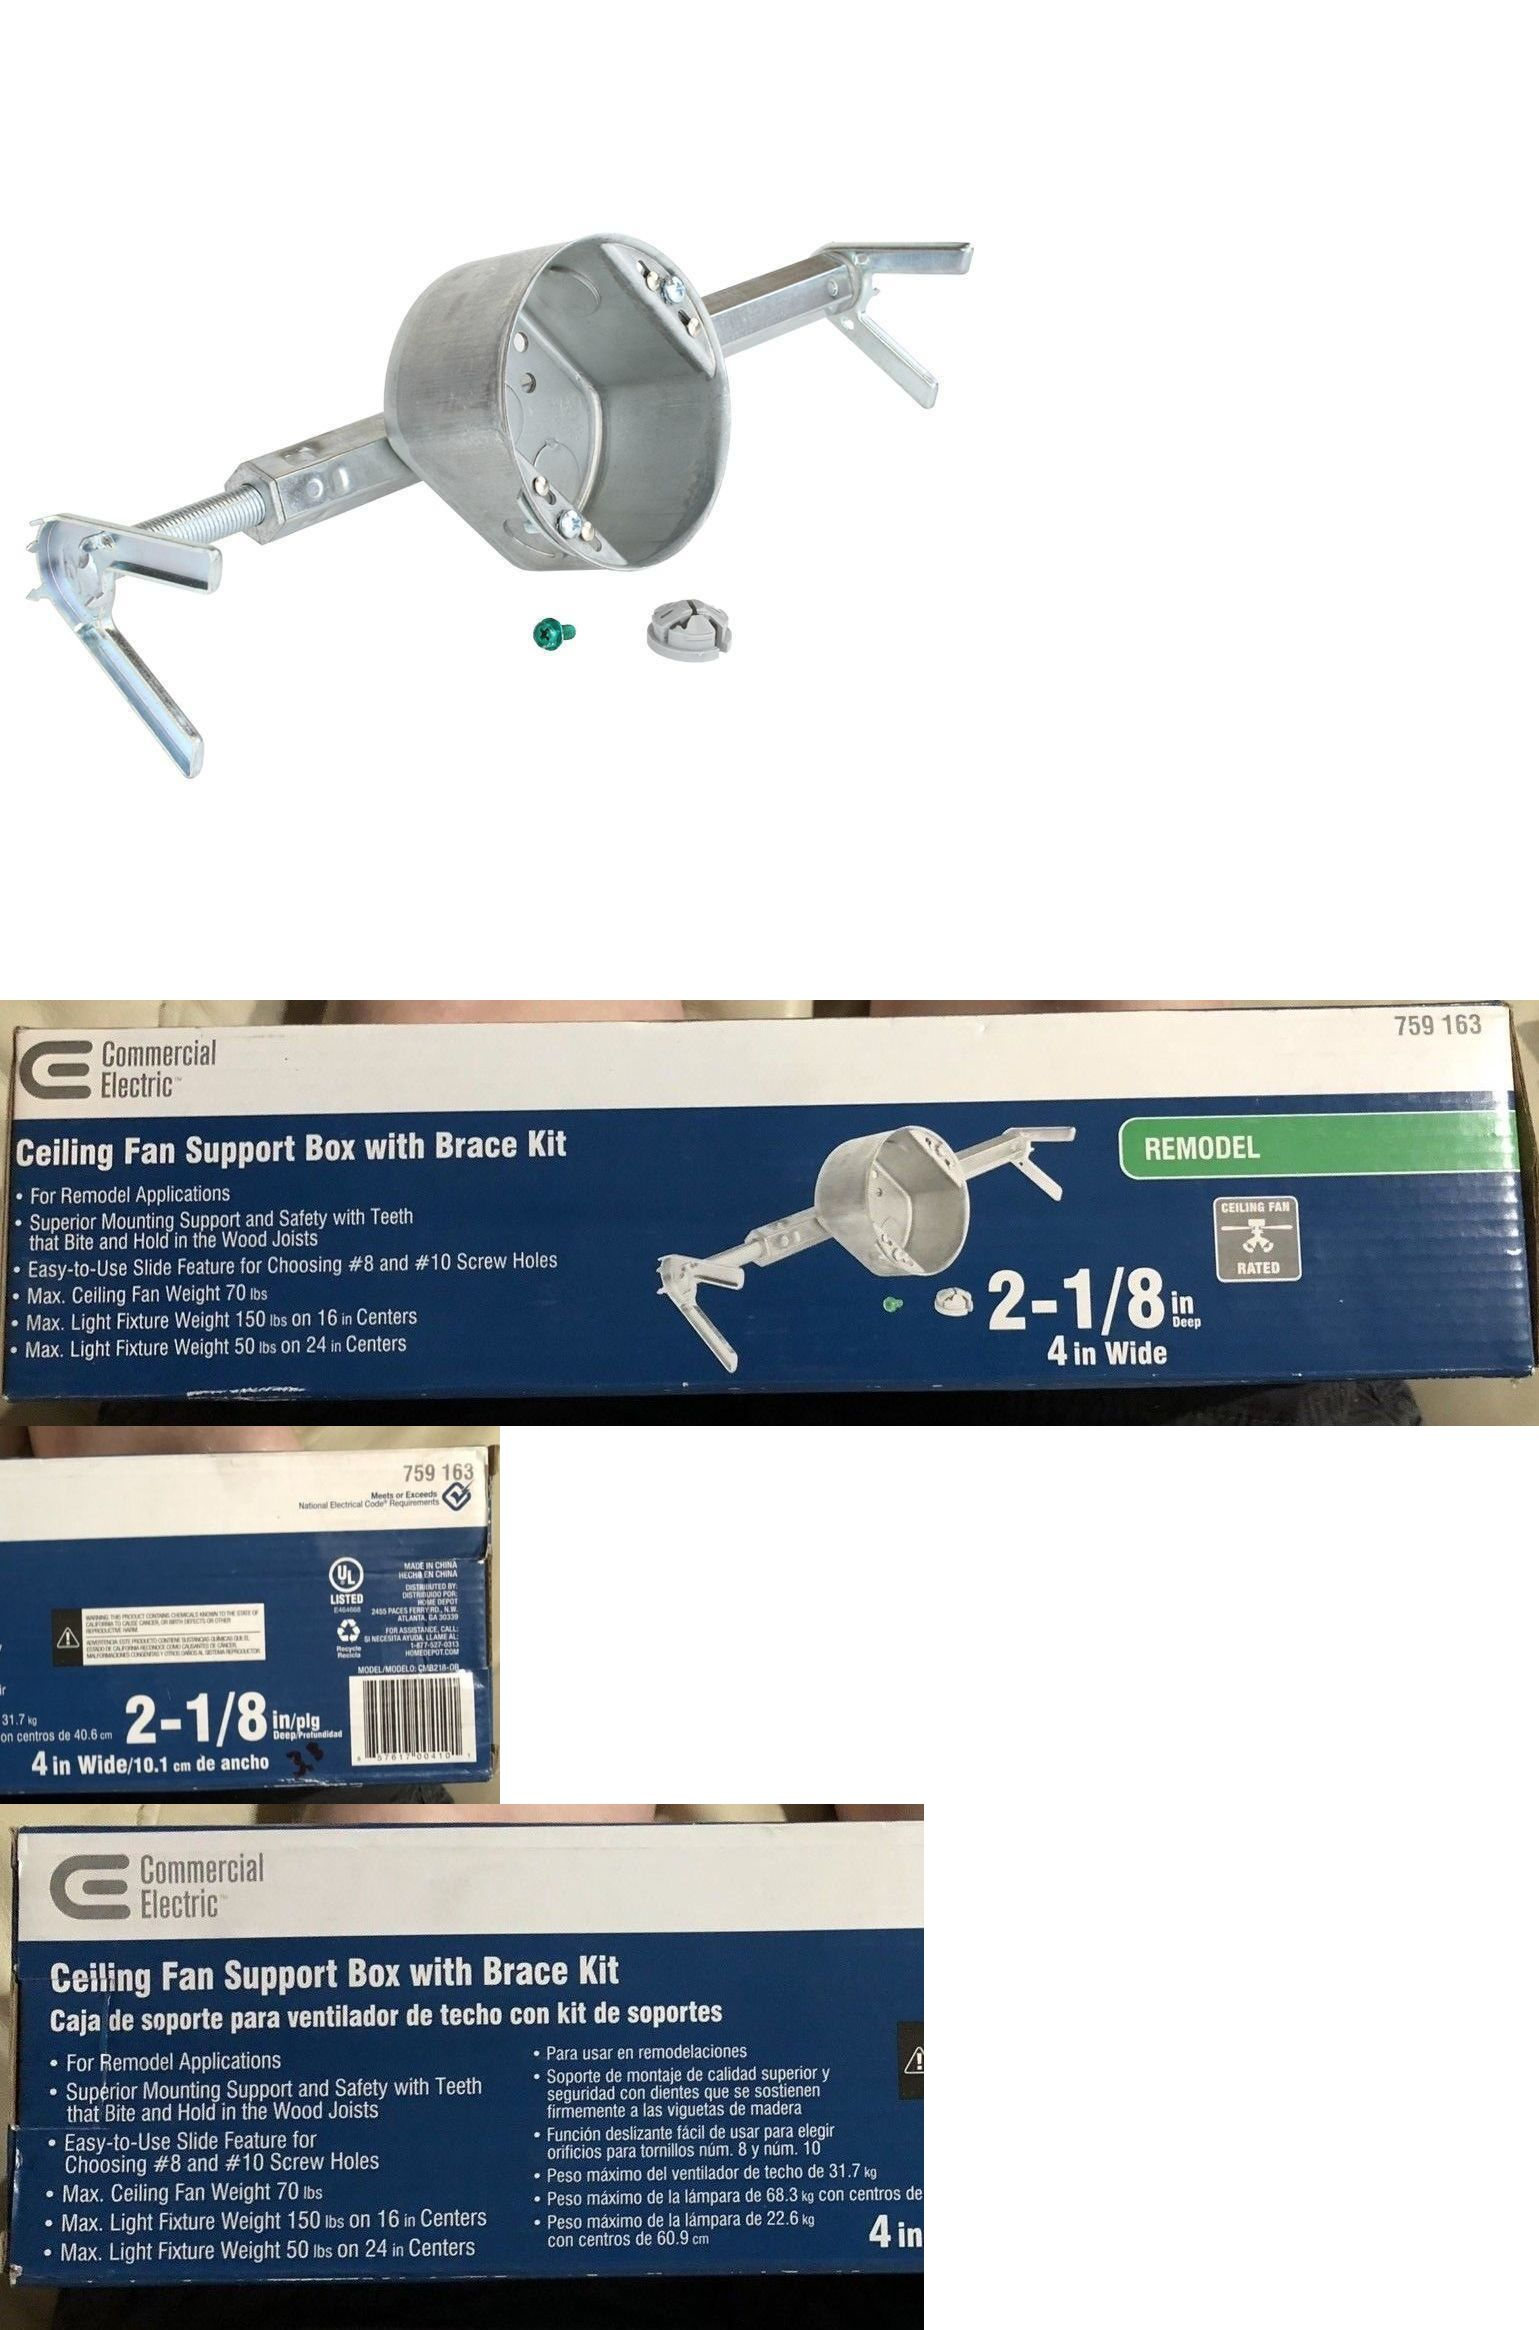 Braces And Brackets 45816 Commercial Electric Ceiling Fan Support Box Brace Kit 2 1 8 In Deep 4 In Wide Bu Commercial Electric Electric Box Boxes For Sale